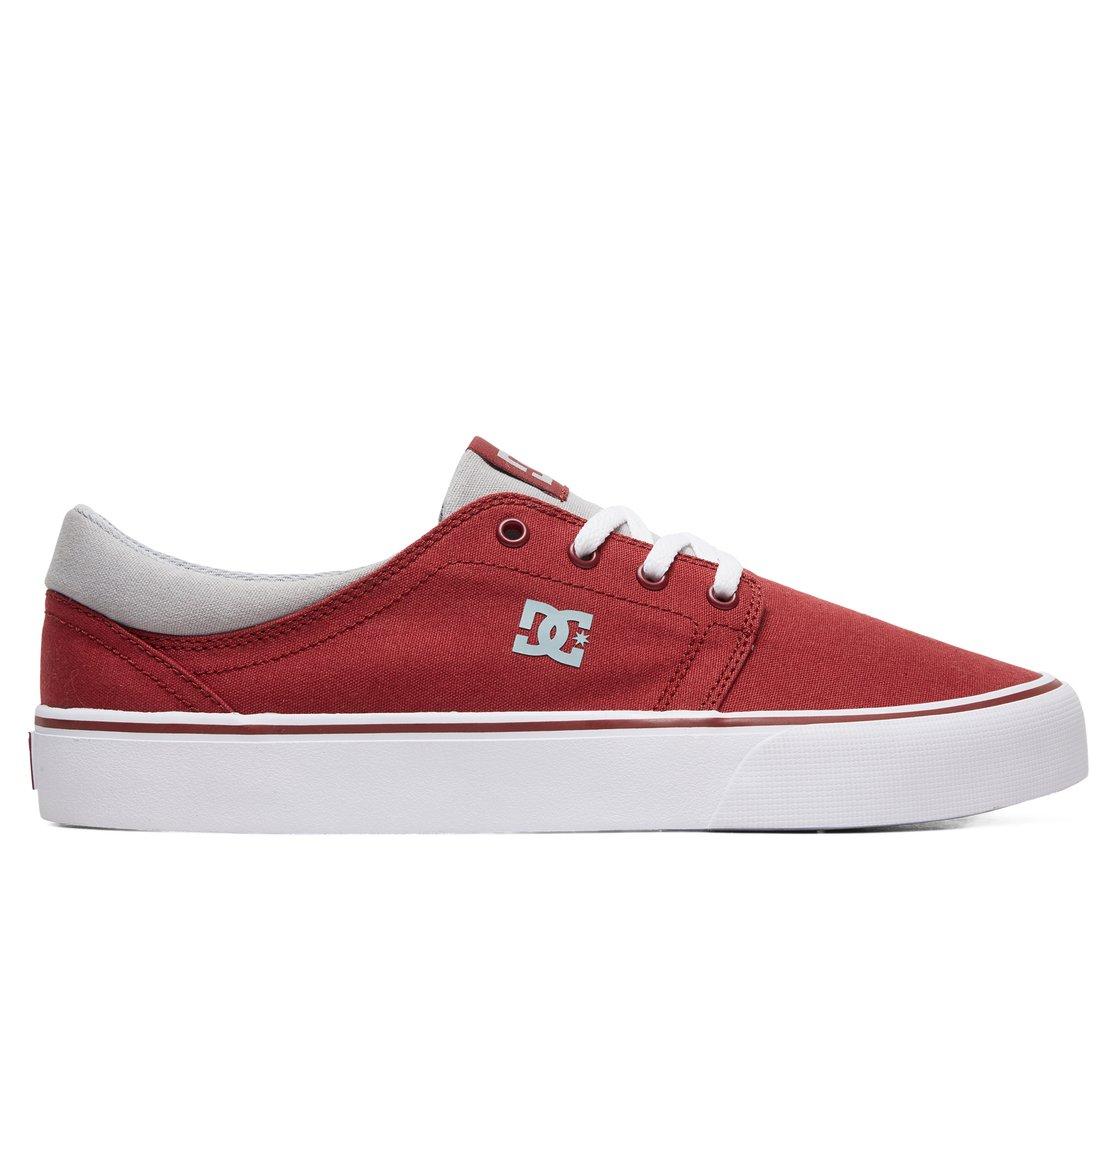 2e77dea267fb 0 Trase TX - Shoes for Men Red ADYS300126 DC Shoes